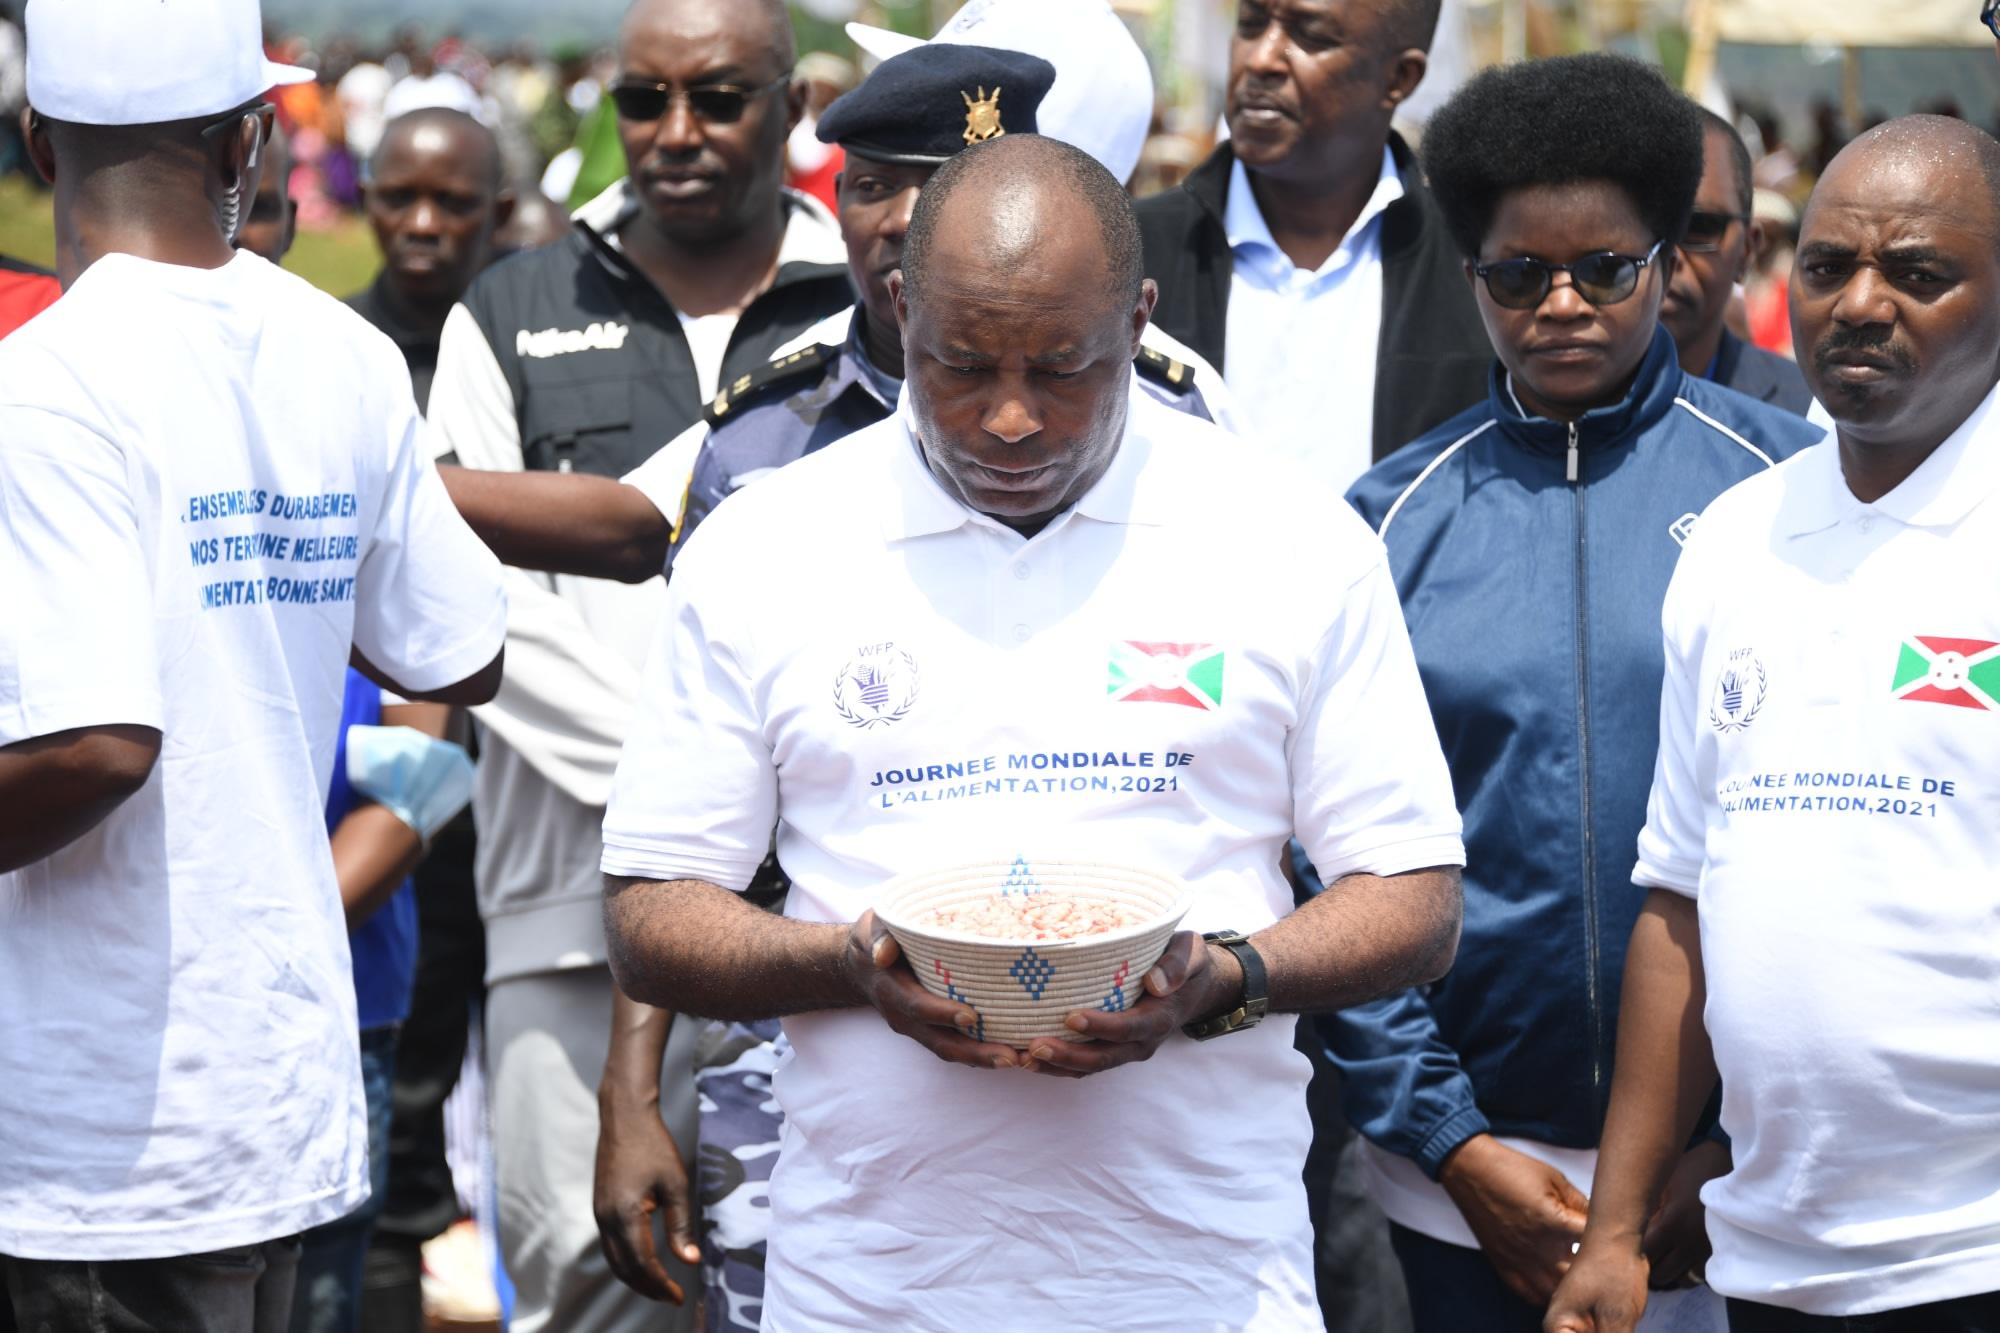 Umukuru w'igihugu Ndayishimiye yatanguje icese irima ry'agatasi